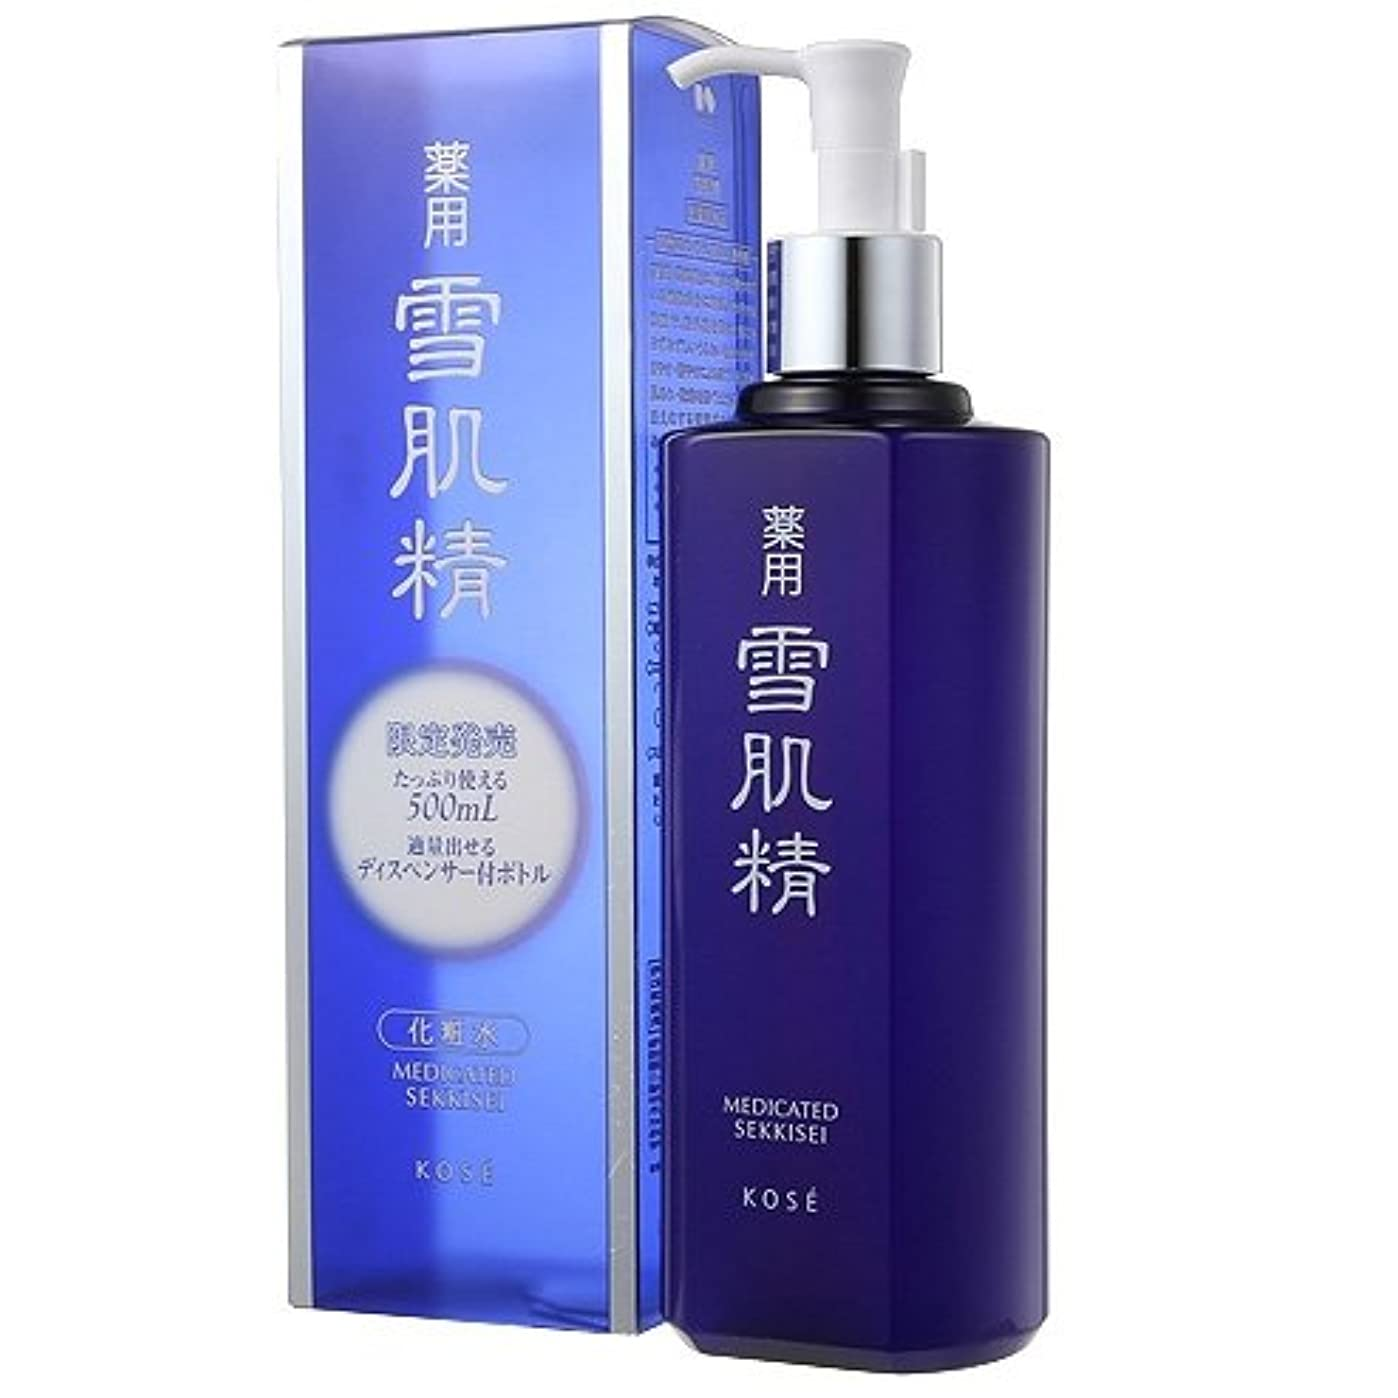 成長文芸食料品店コーセー(KOSE) 雪肌精 雪肌精 化粧水(500ml)BIGボトル(並行輸入品)